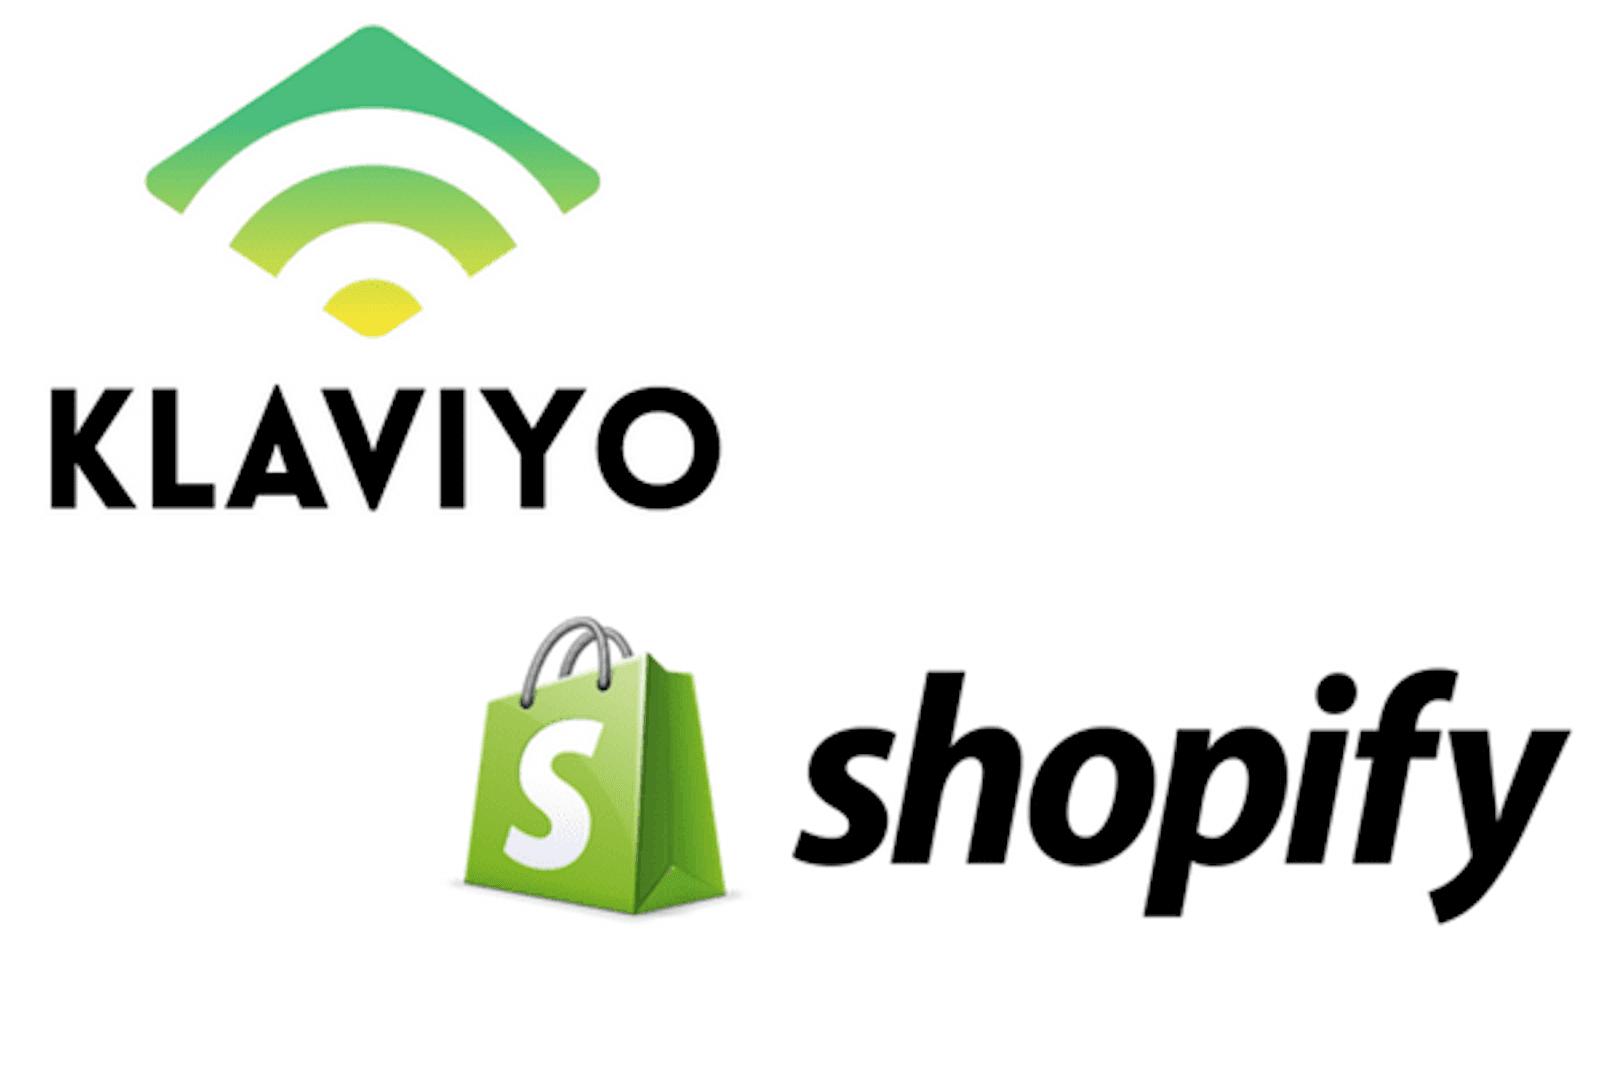 Klaviyo and Shopify logos